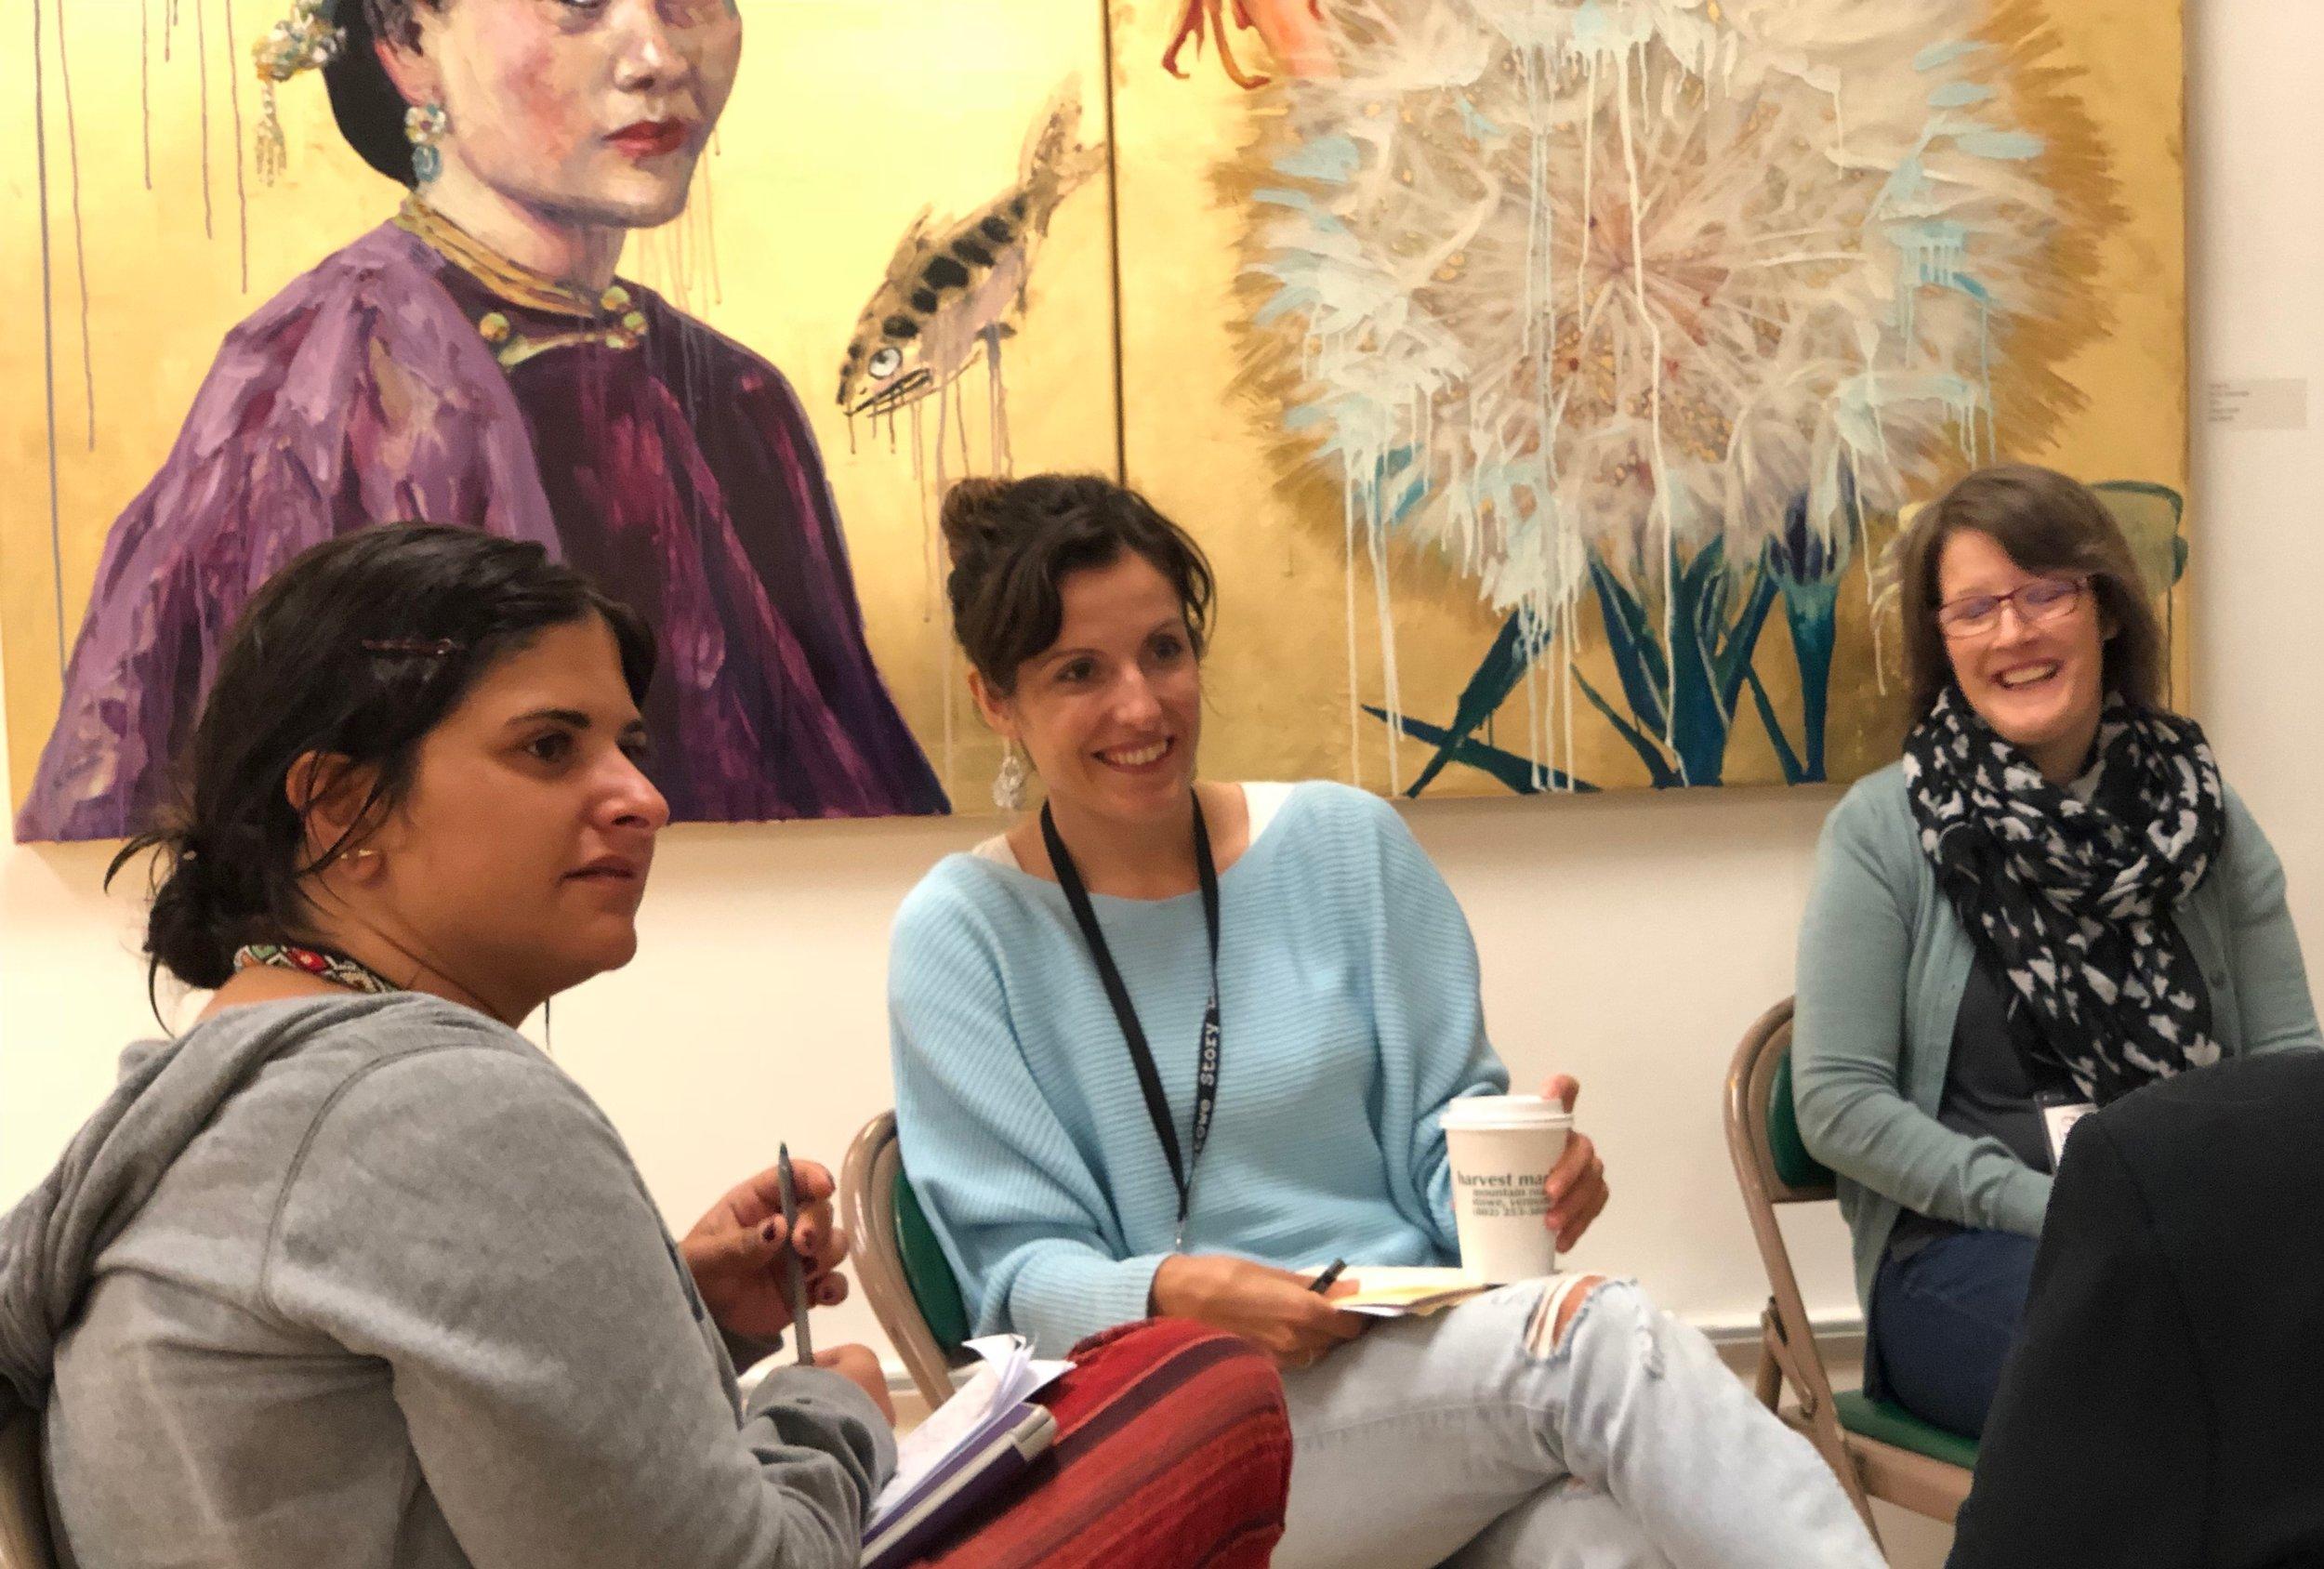 Eszter Angyalosy mentors at Fall 2018 Narrative Lab